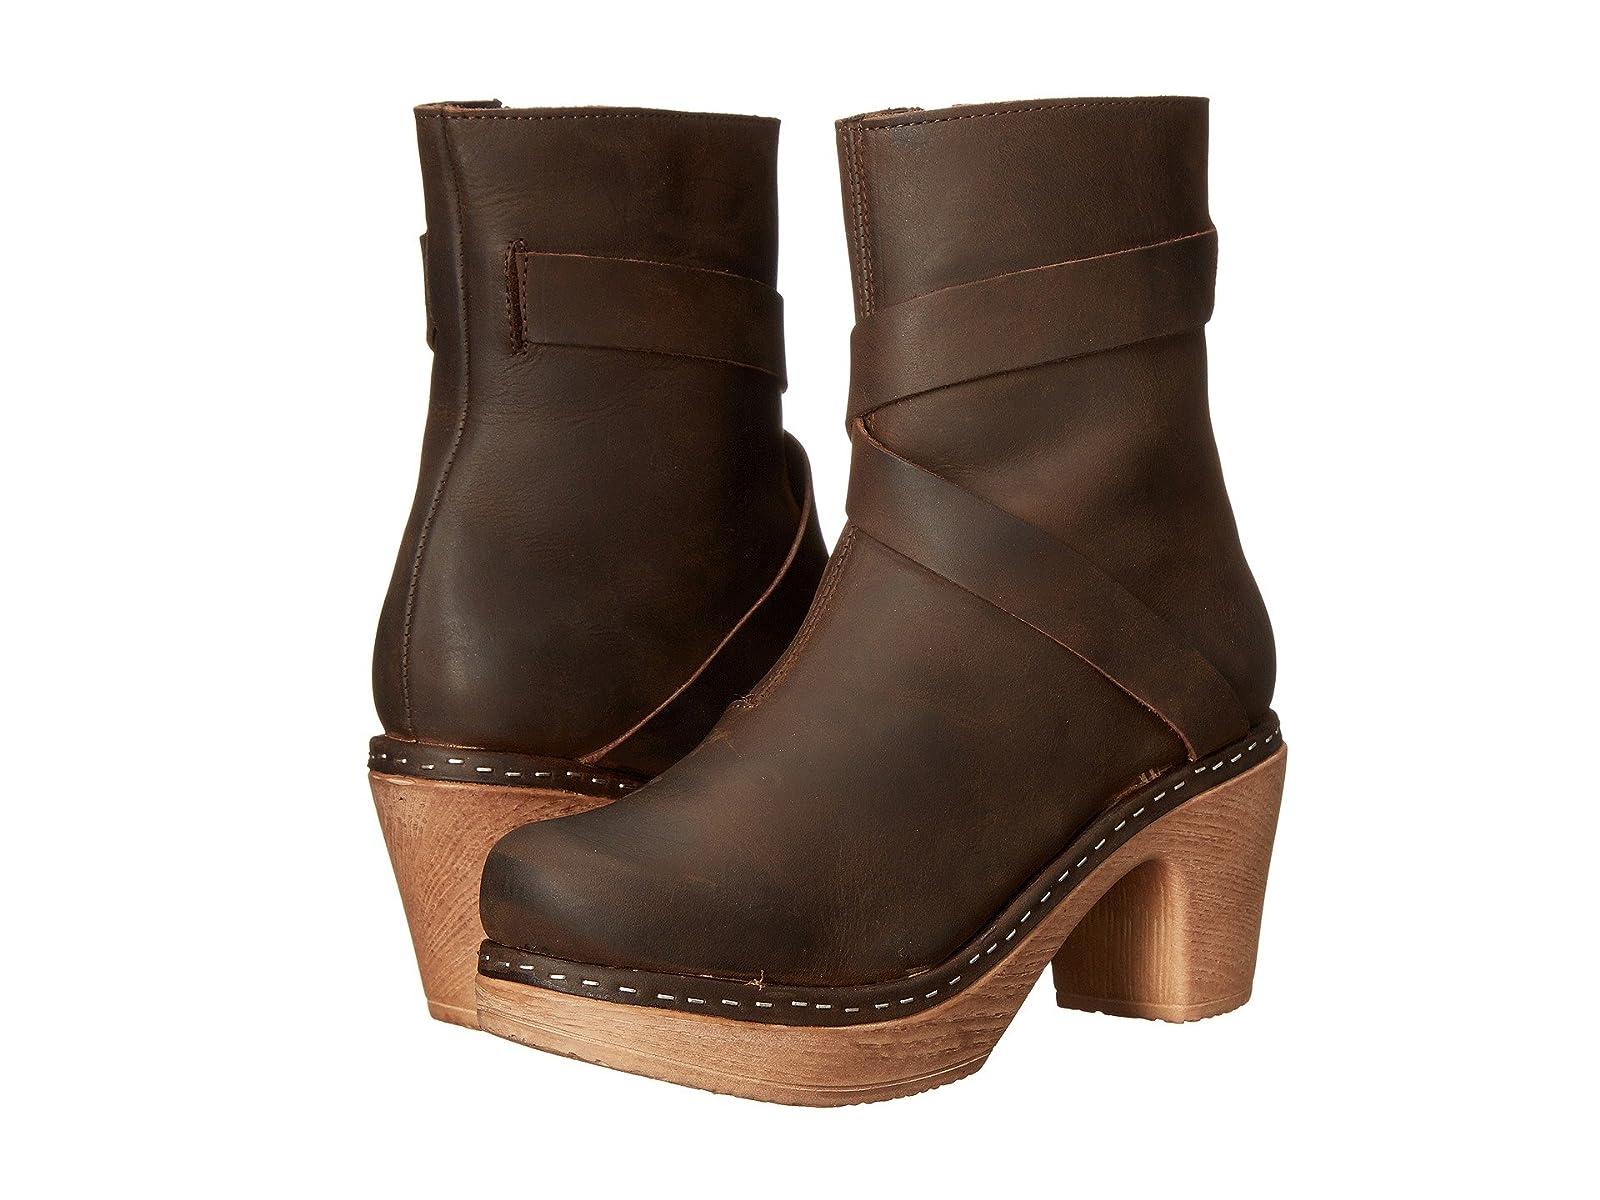 Calou Stockholm JuliaCheap and distinctive eye-catching shoes